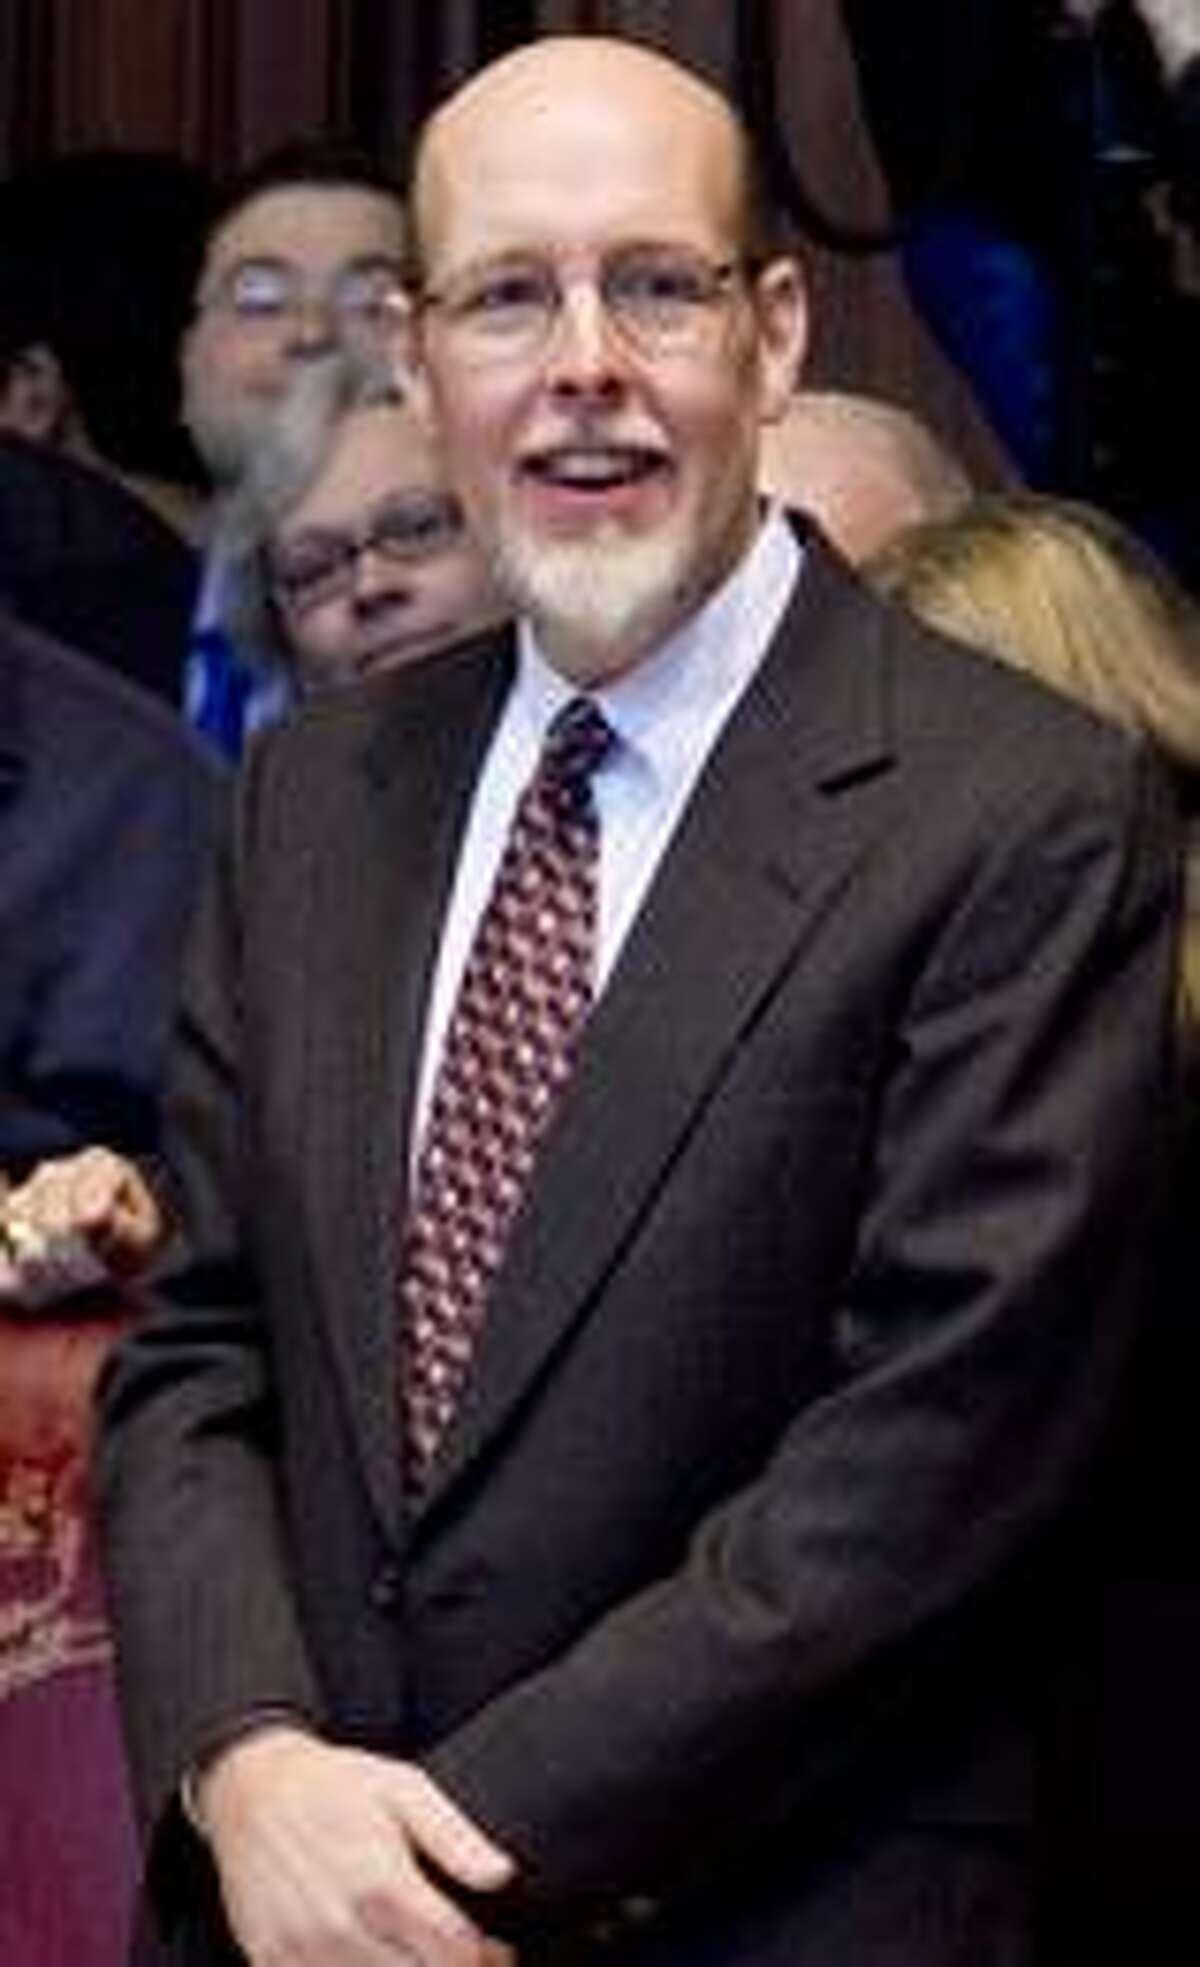 Sen. Joe Markley, R-Southington, is fighting state election regulators in Superior Court.